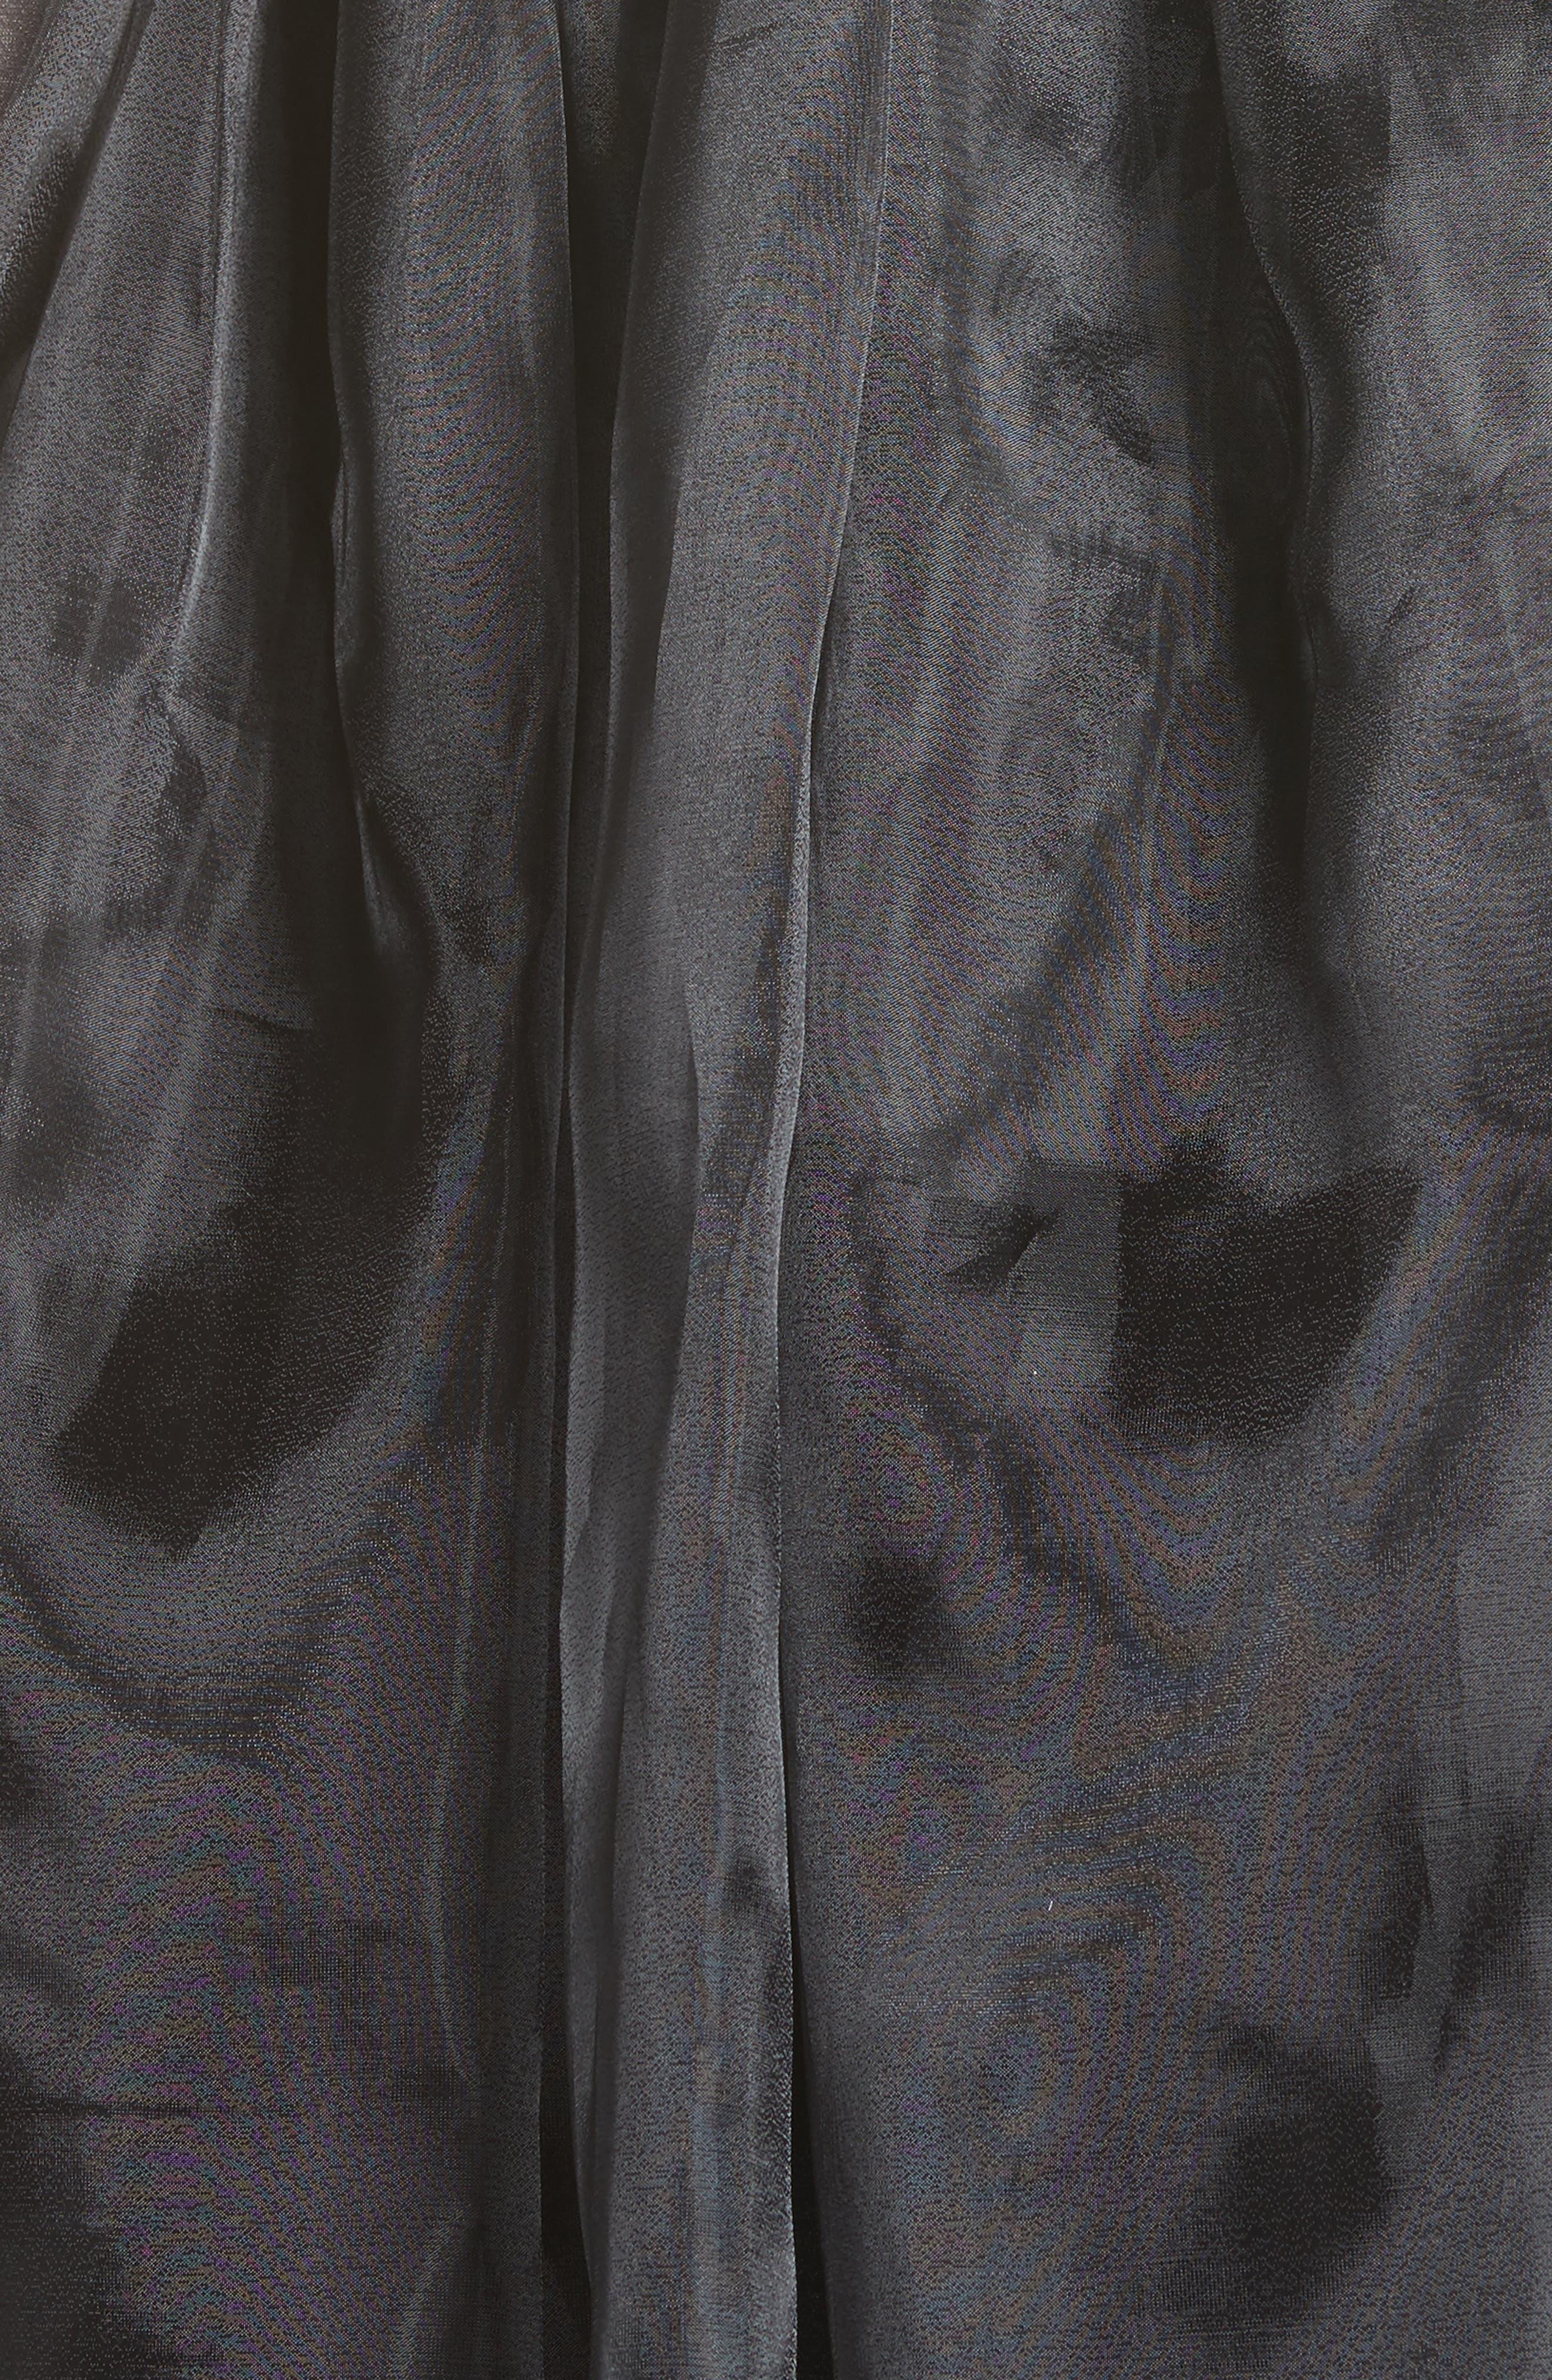 Addison Tulle Dress,                             Alternate thumbnail 6, color,                             001